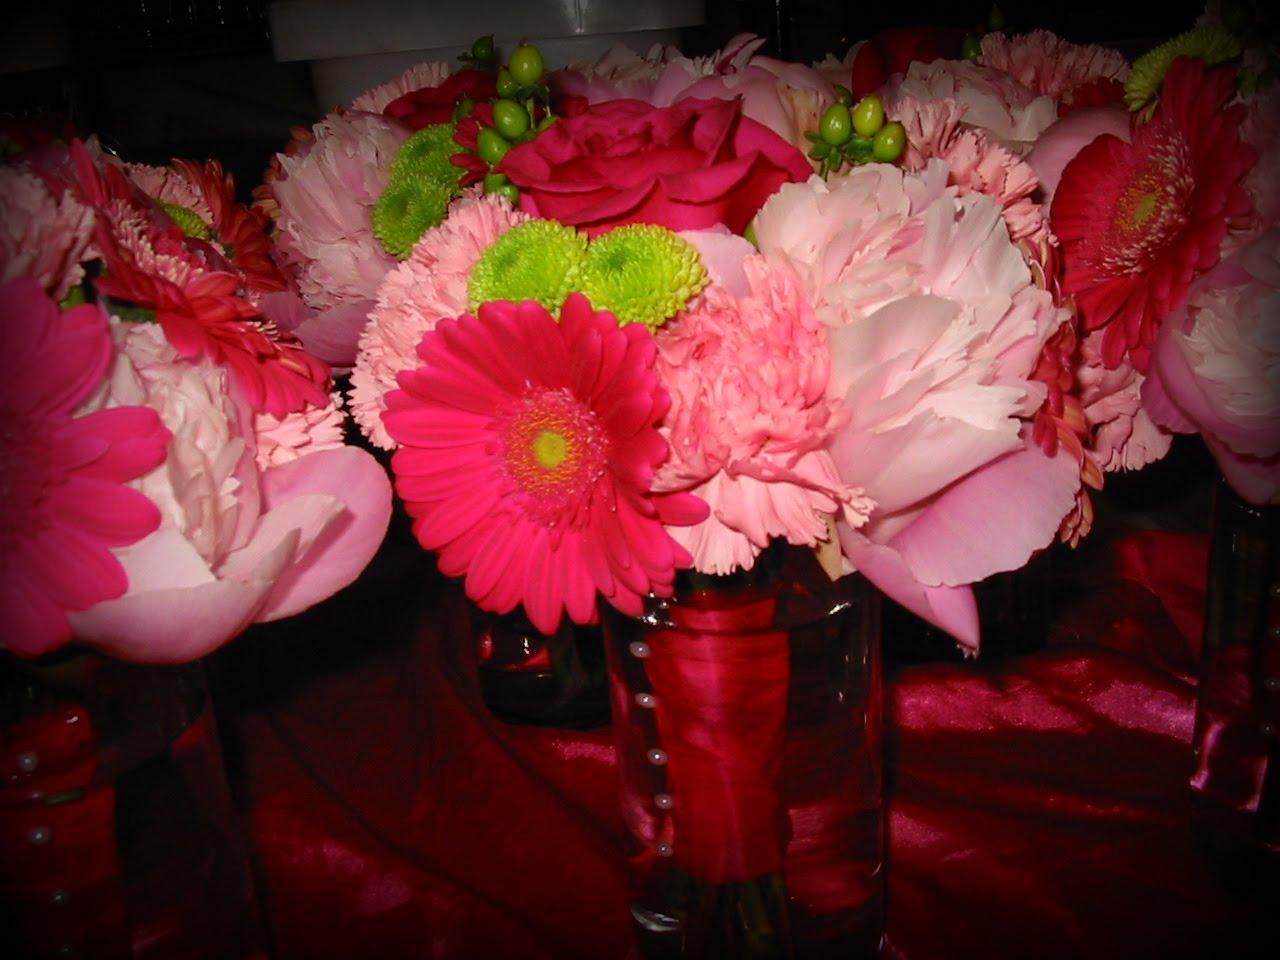 Wedding in Peonies, Gerbera Daisies, and Roses | Flowers From ...